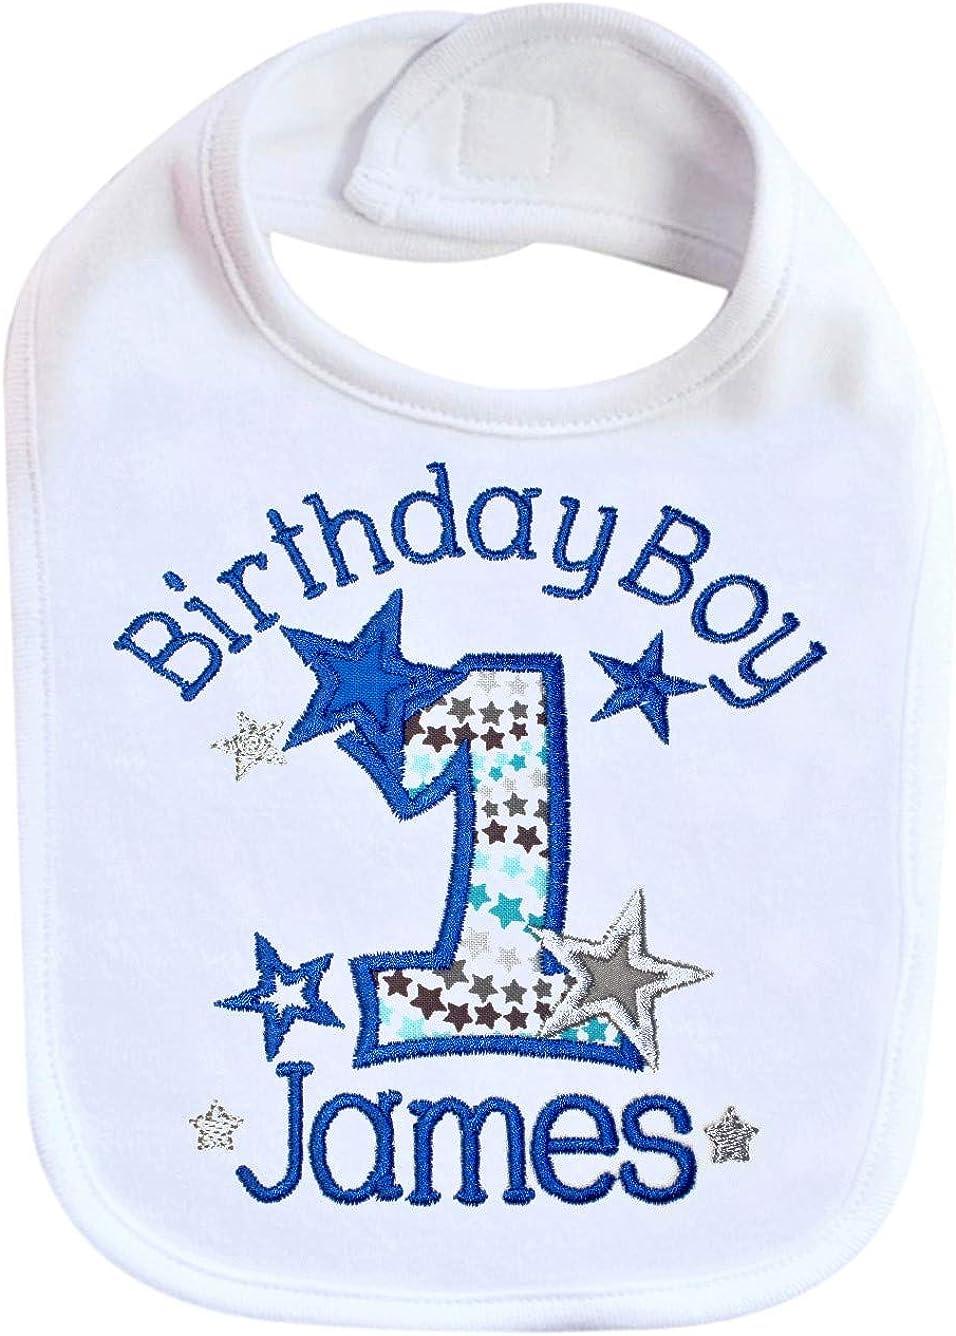 Boys First Birthday Bib King First Birthday Bib First Birthday bib-Monogram Birthday Bibs Baby Bibs- Prince 1st Birthday Bib